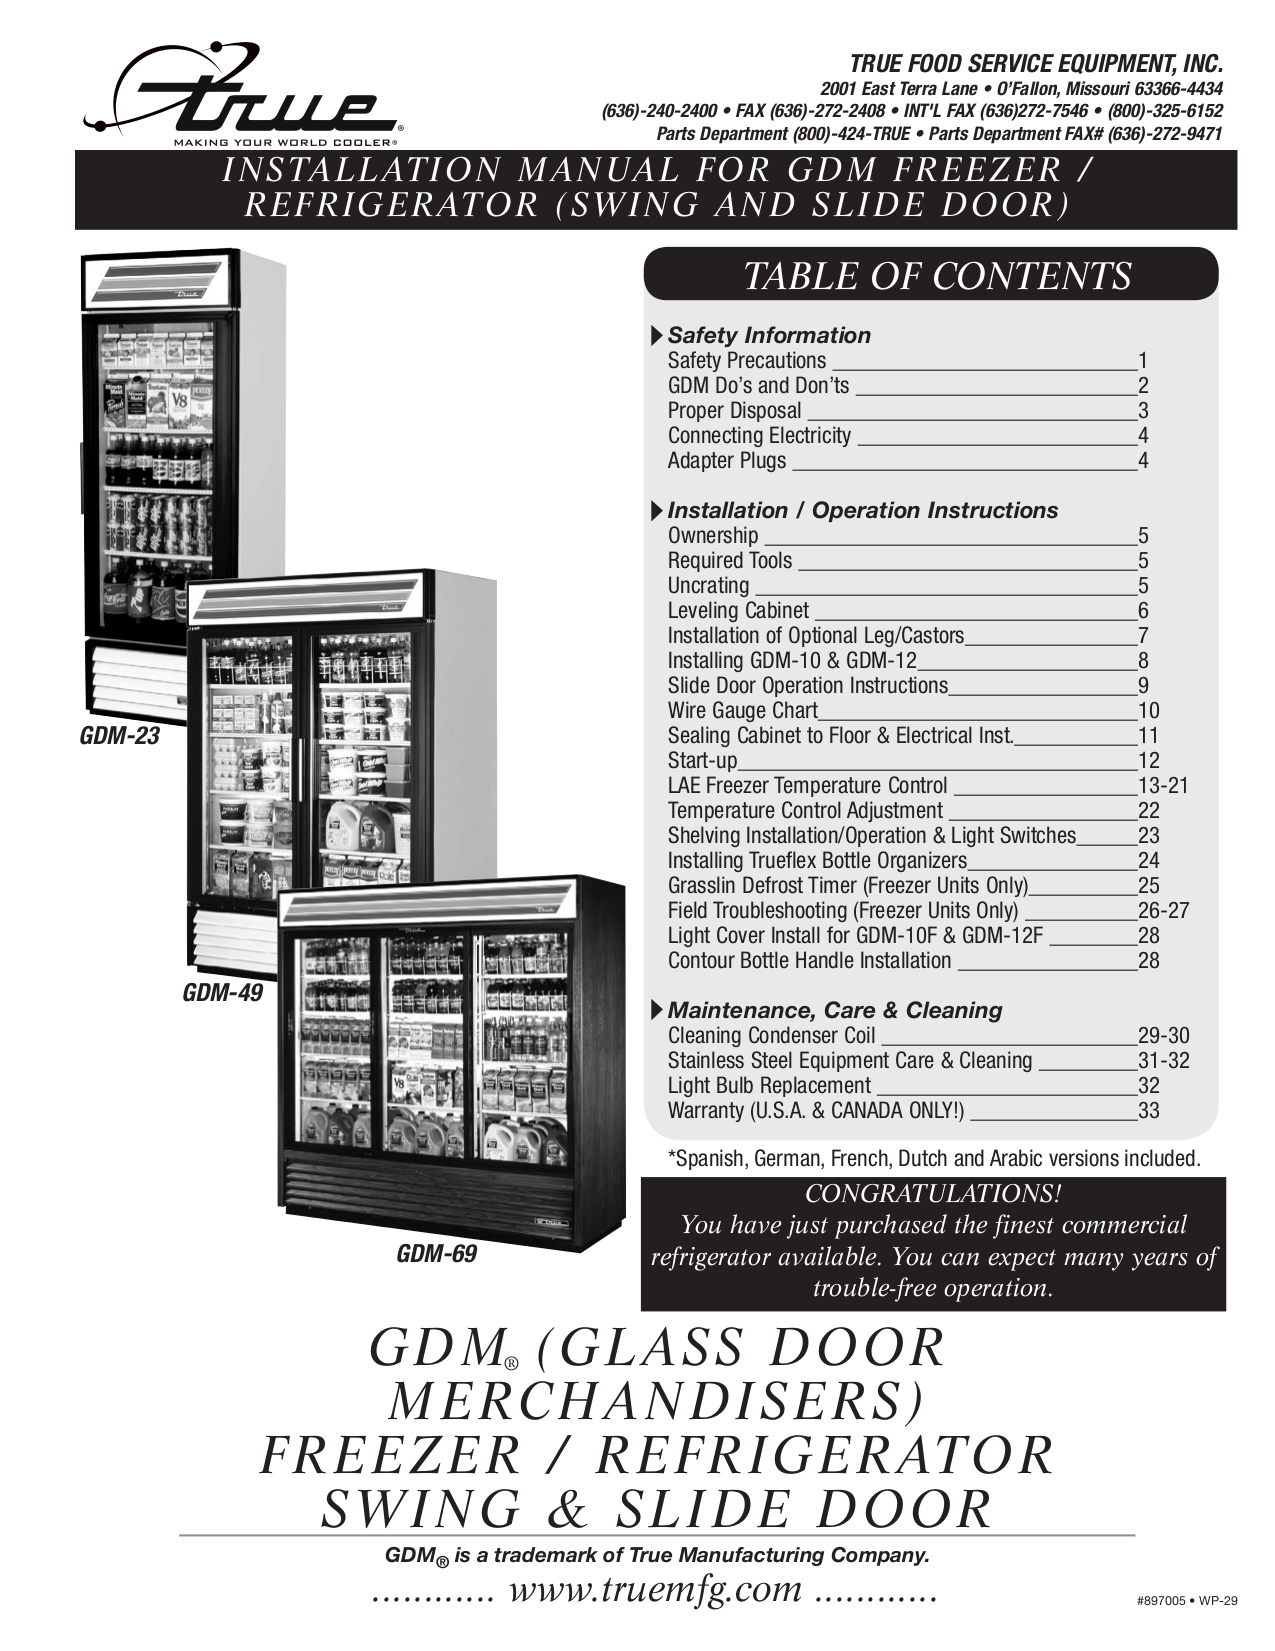 GDM Freezer_Refrigerator.pdf 0 download free pdf for true gdm 72f freezer manual true t 72f wiring diagram at virtualis.co